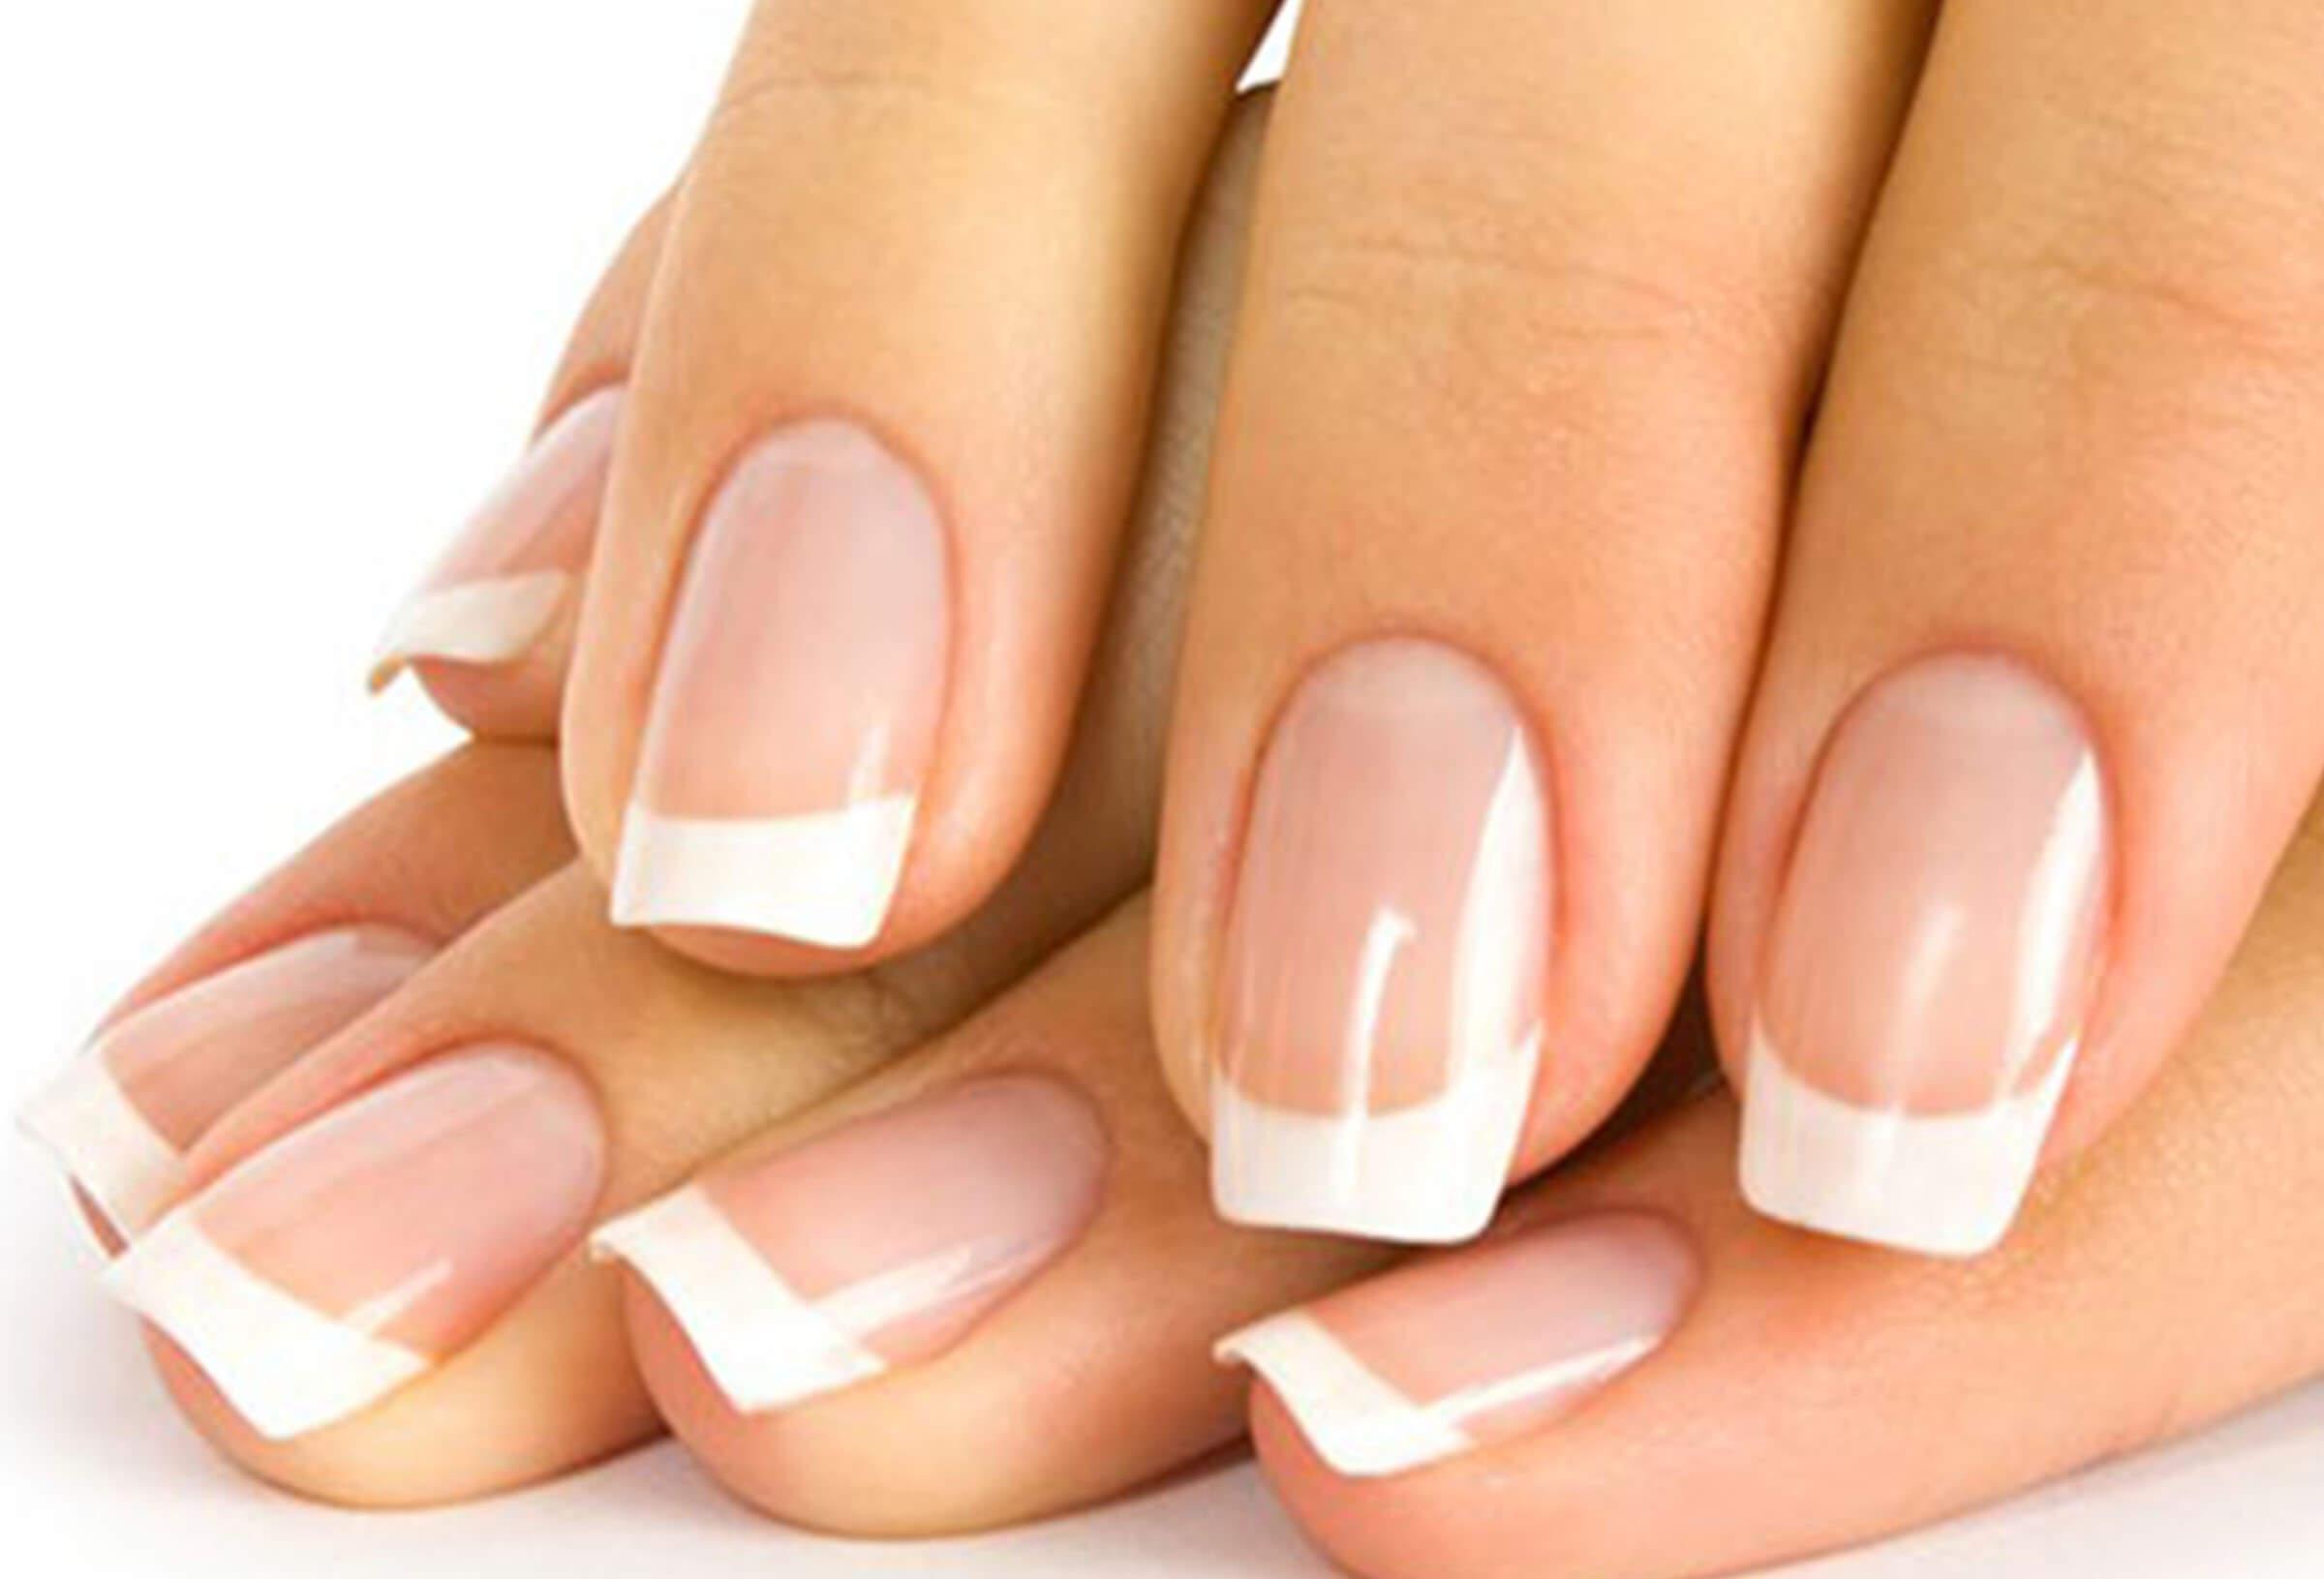 Laman spa - Hand & Foot Care